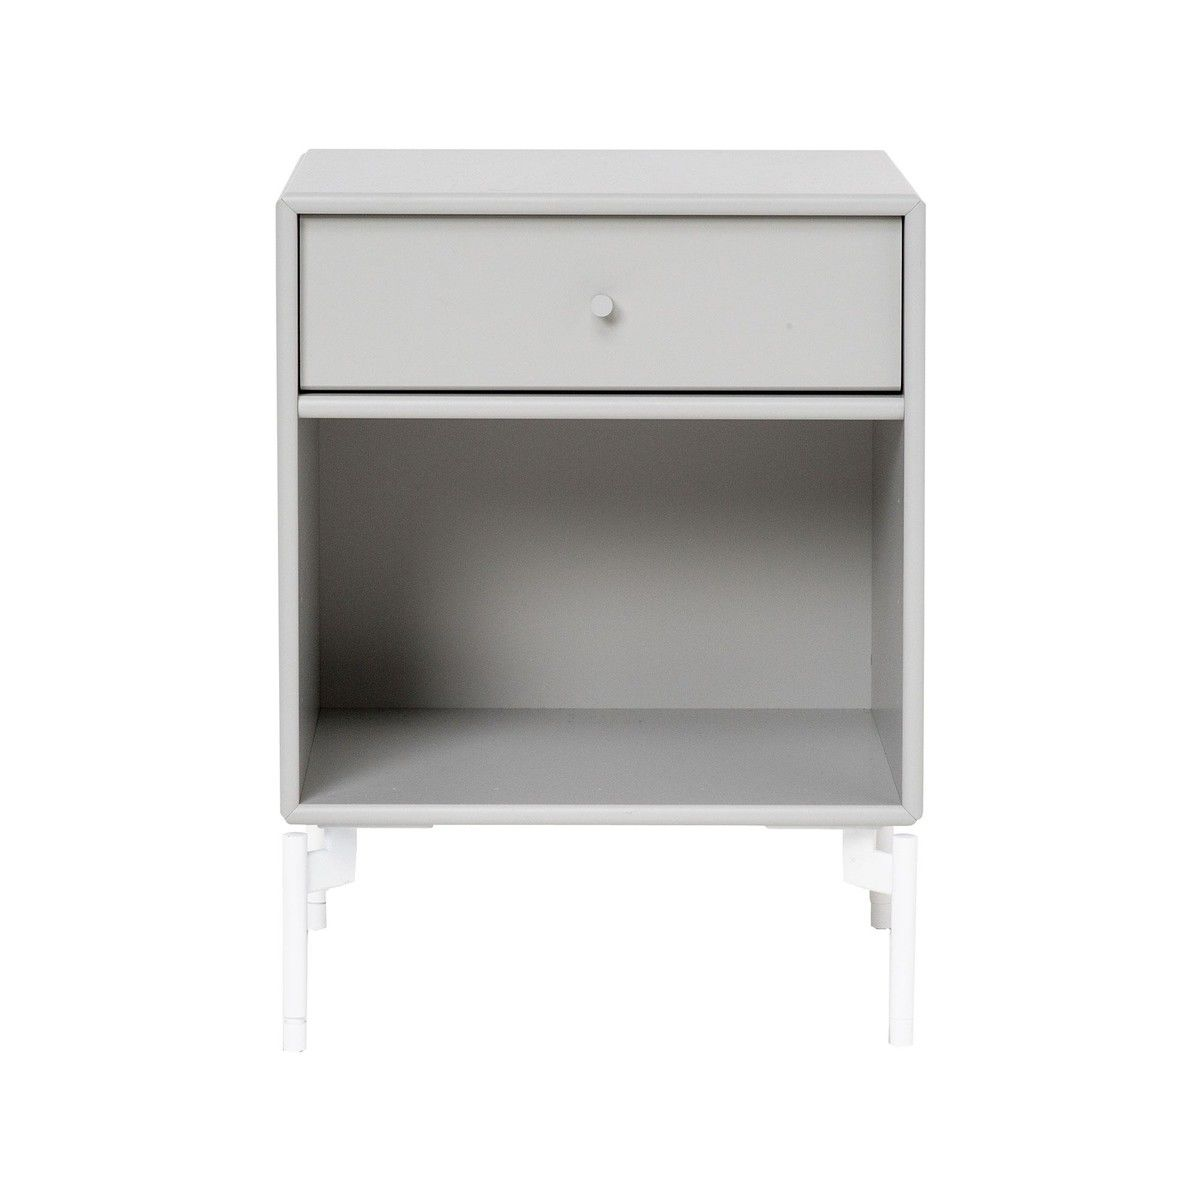 table de chevet kartell perfect lampe a poser kartell b. Black Bedroom Furniture Sets. Home Design Ideas